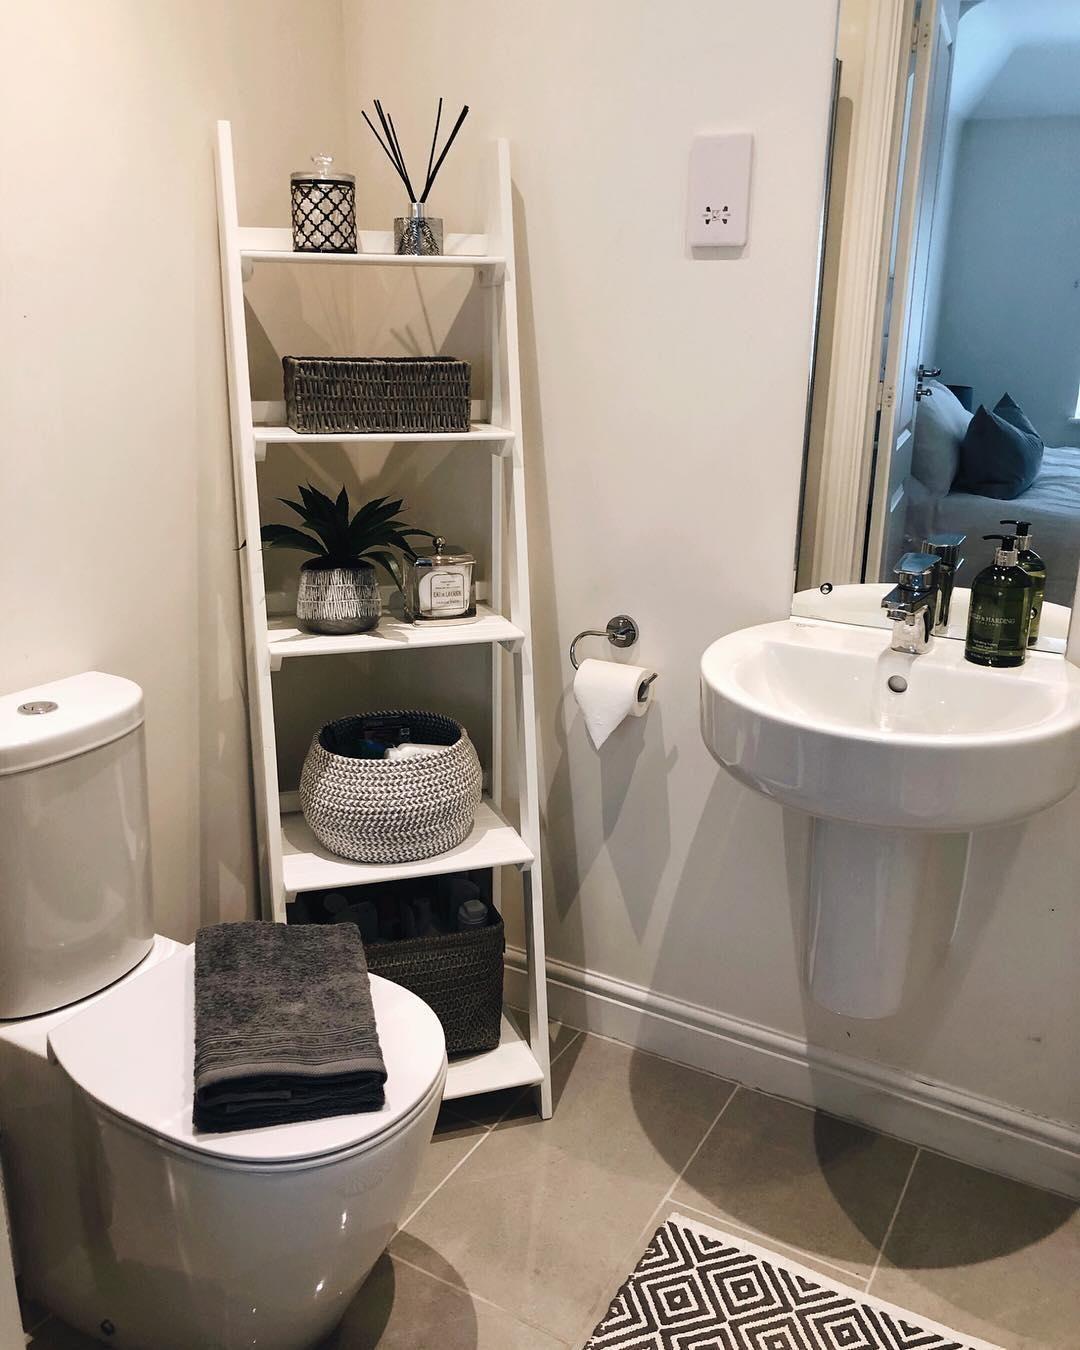 28 Impressive Bathroom Storage Ideas Smart Solution Big Impact! #bathroomdecoration